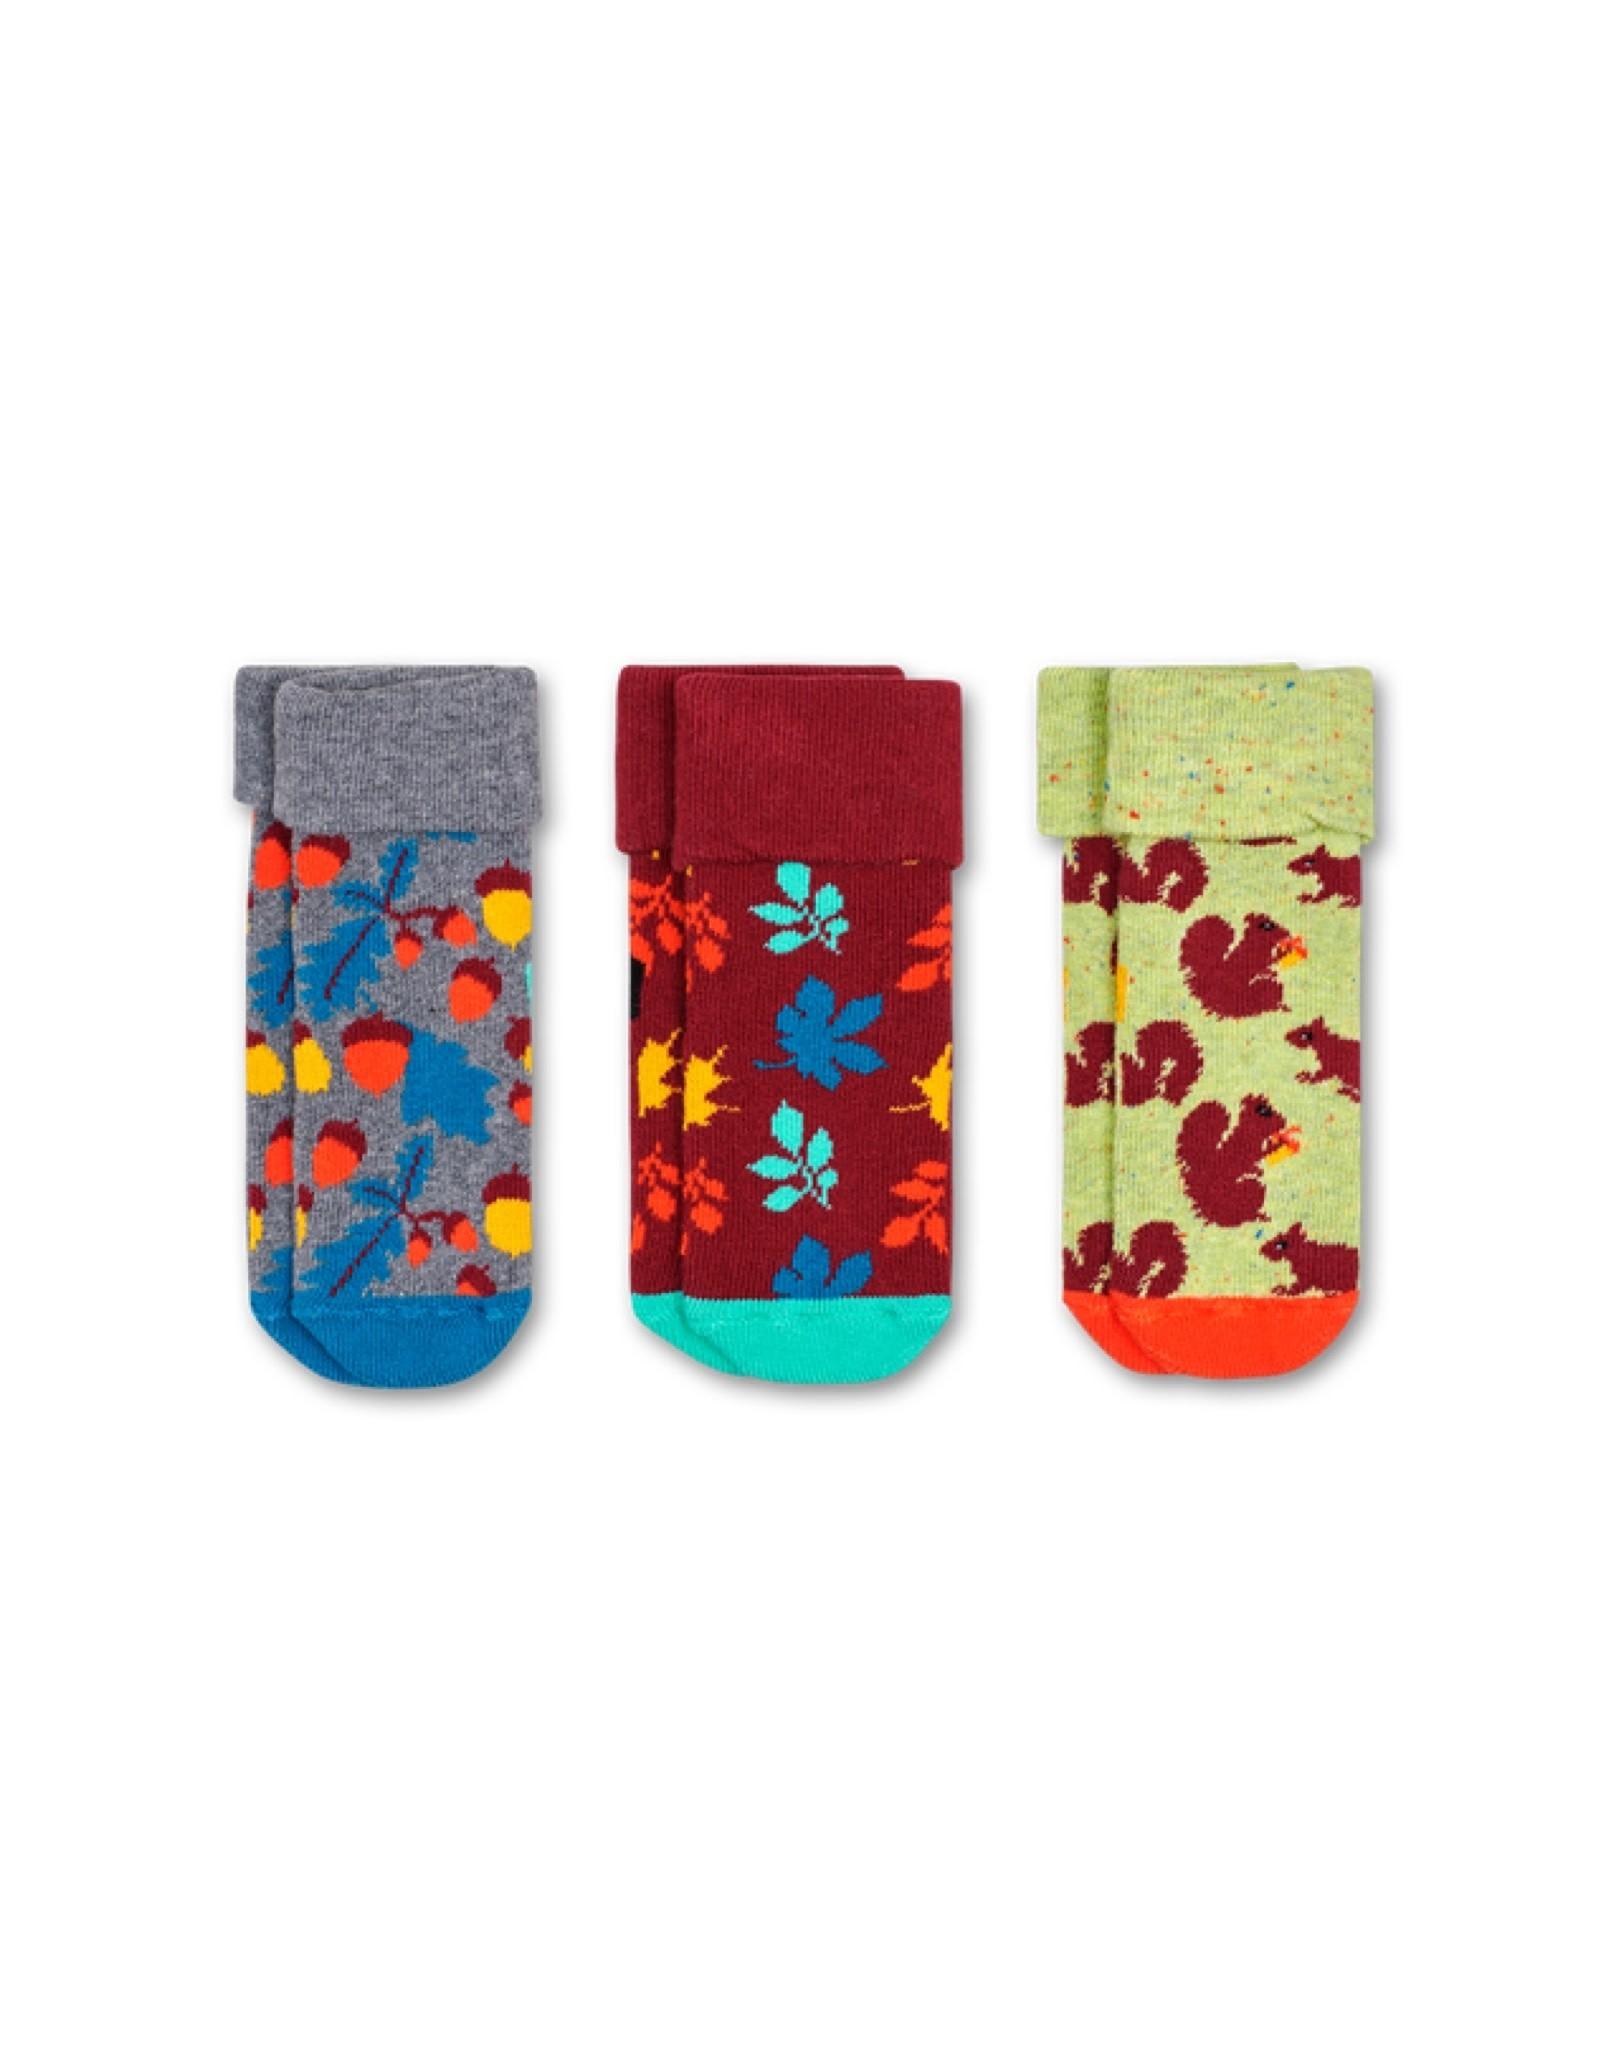 Happy Socks Nuts & a squirrel socks 0-6m